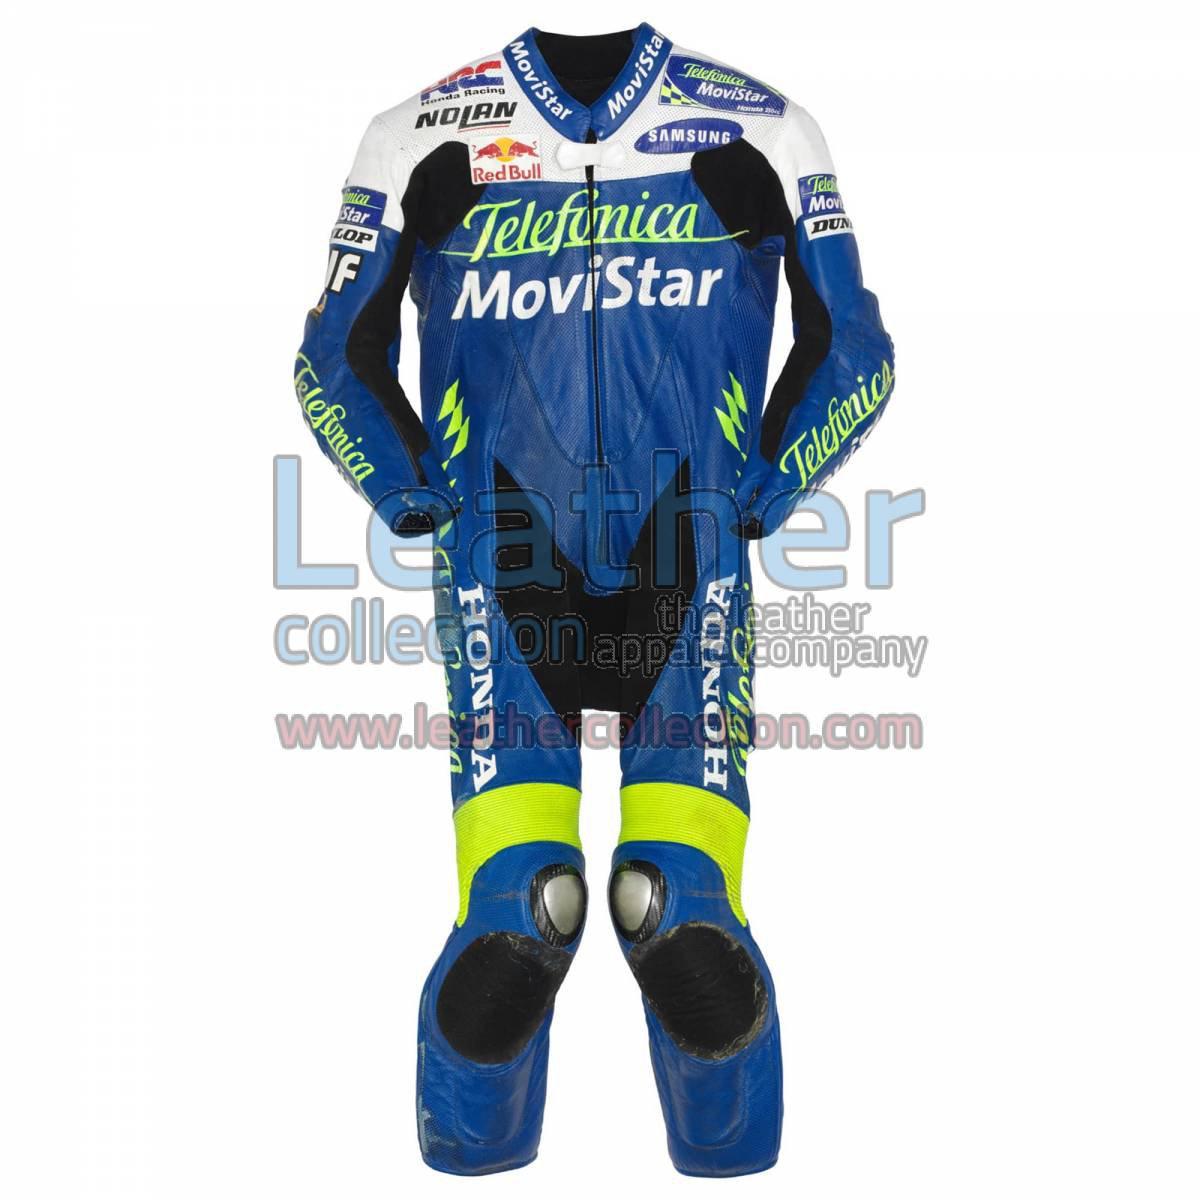 Dani Pedrosa Movistar Honda GP 2004 Leather Suit